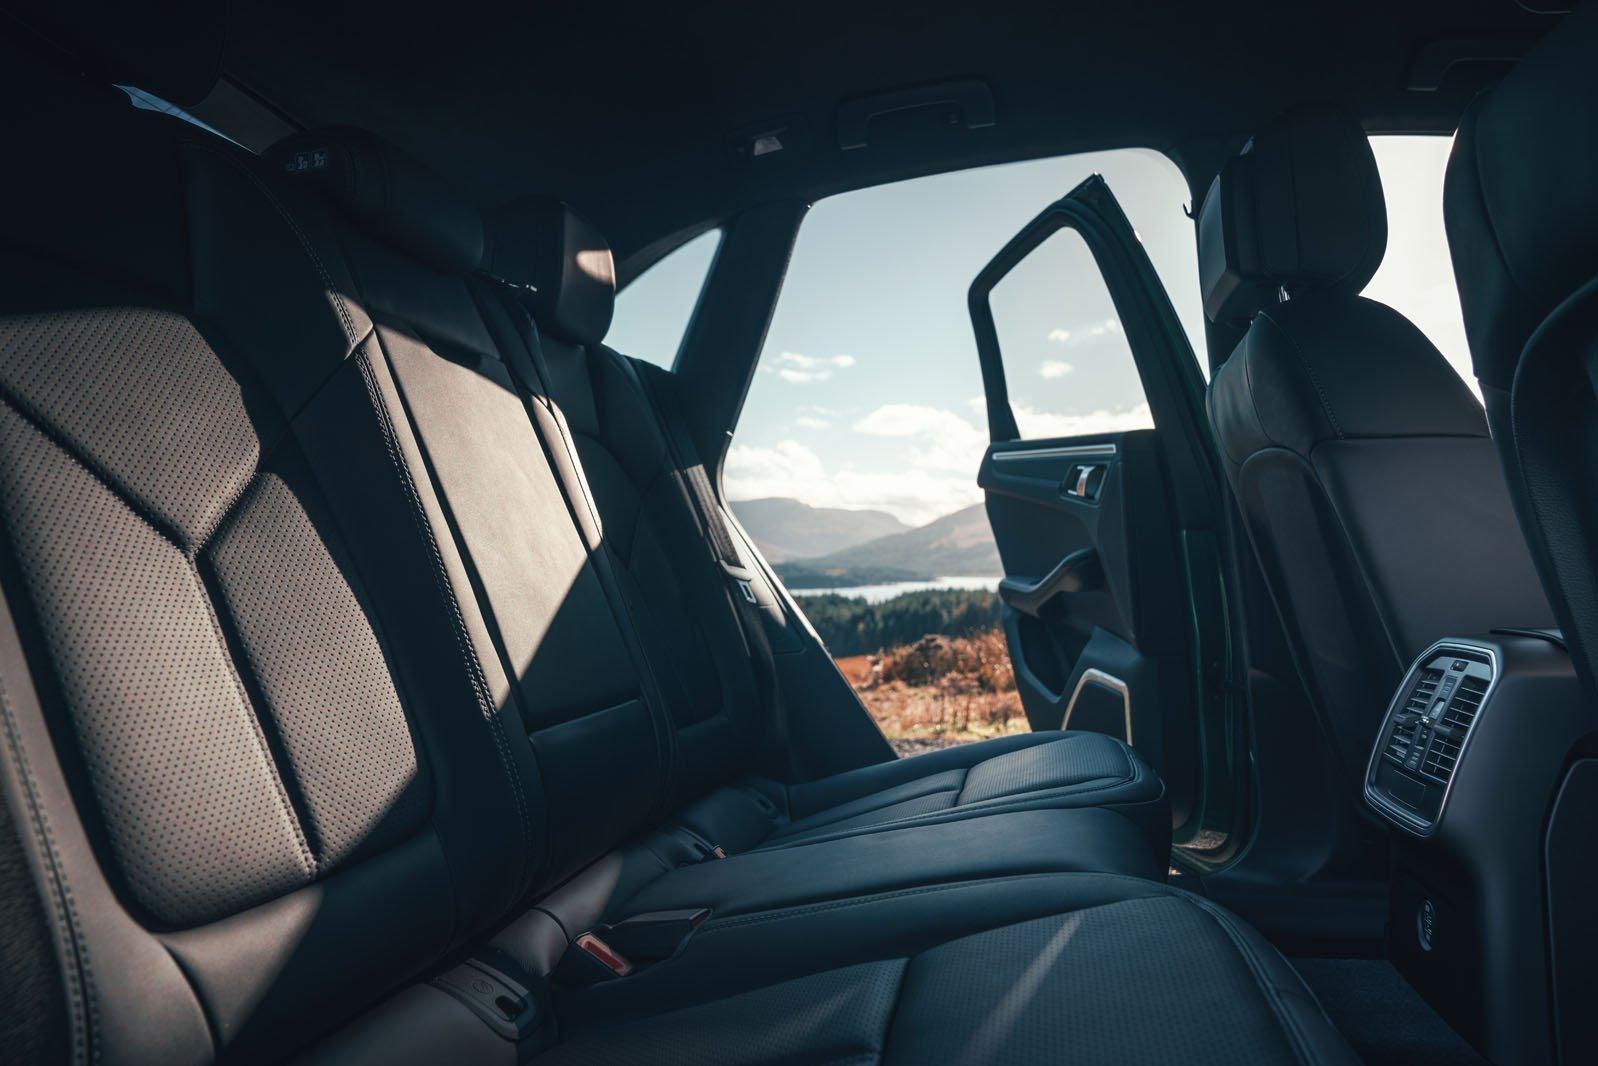 2019 Porsche Macan rear seats